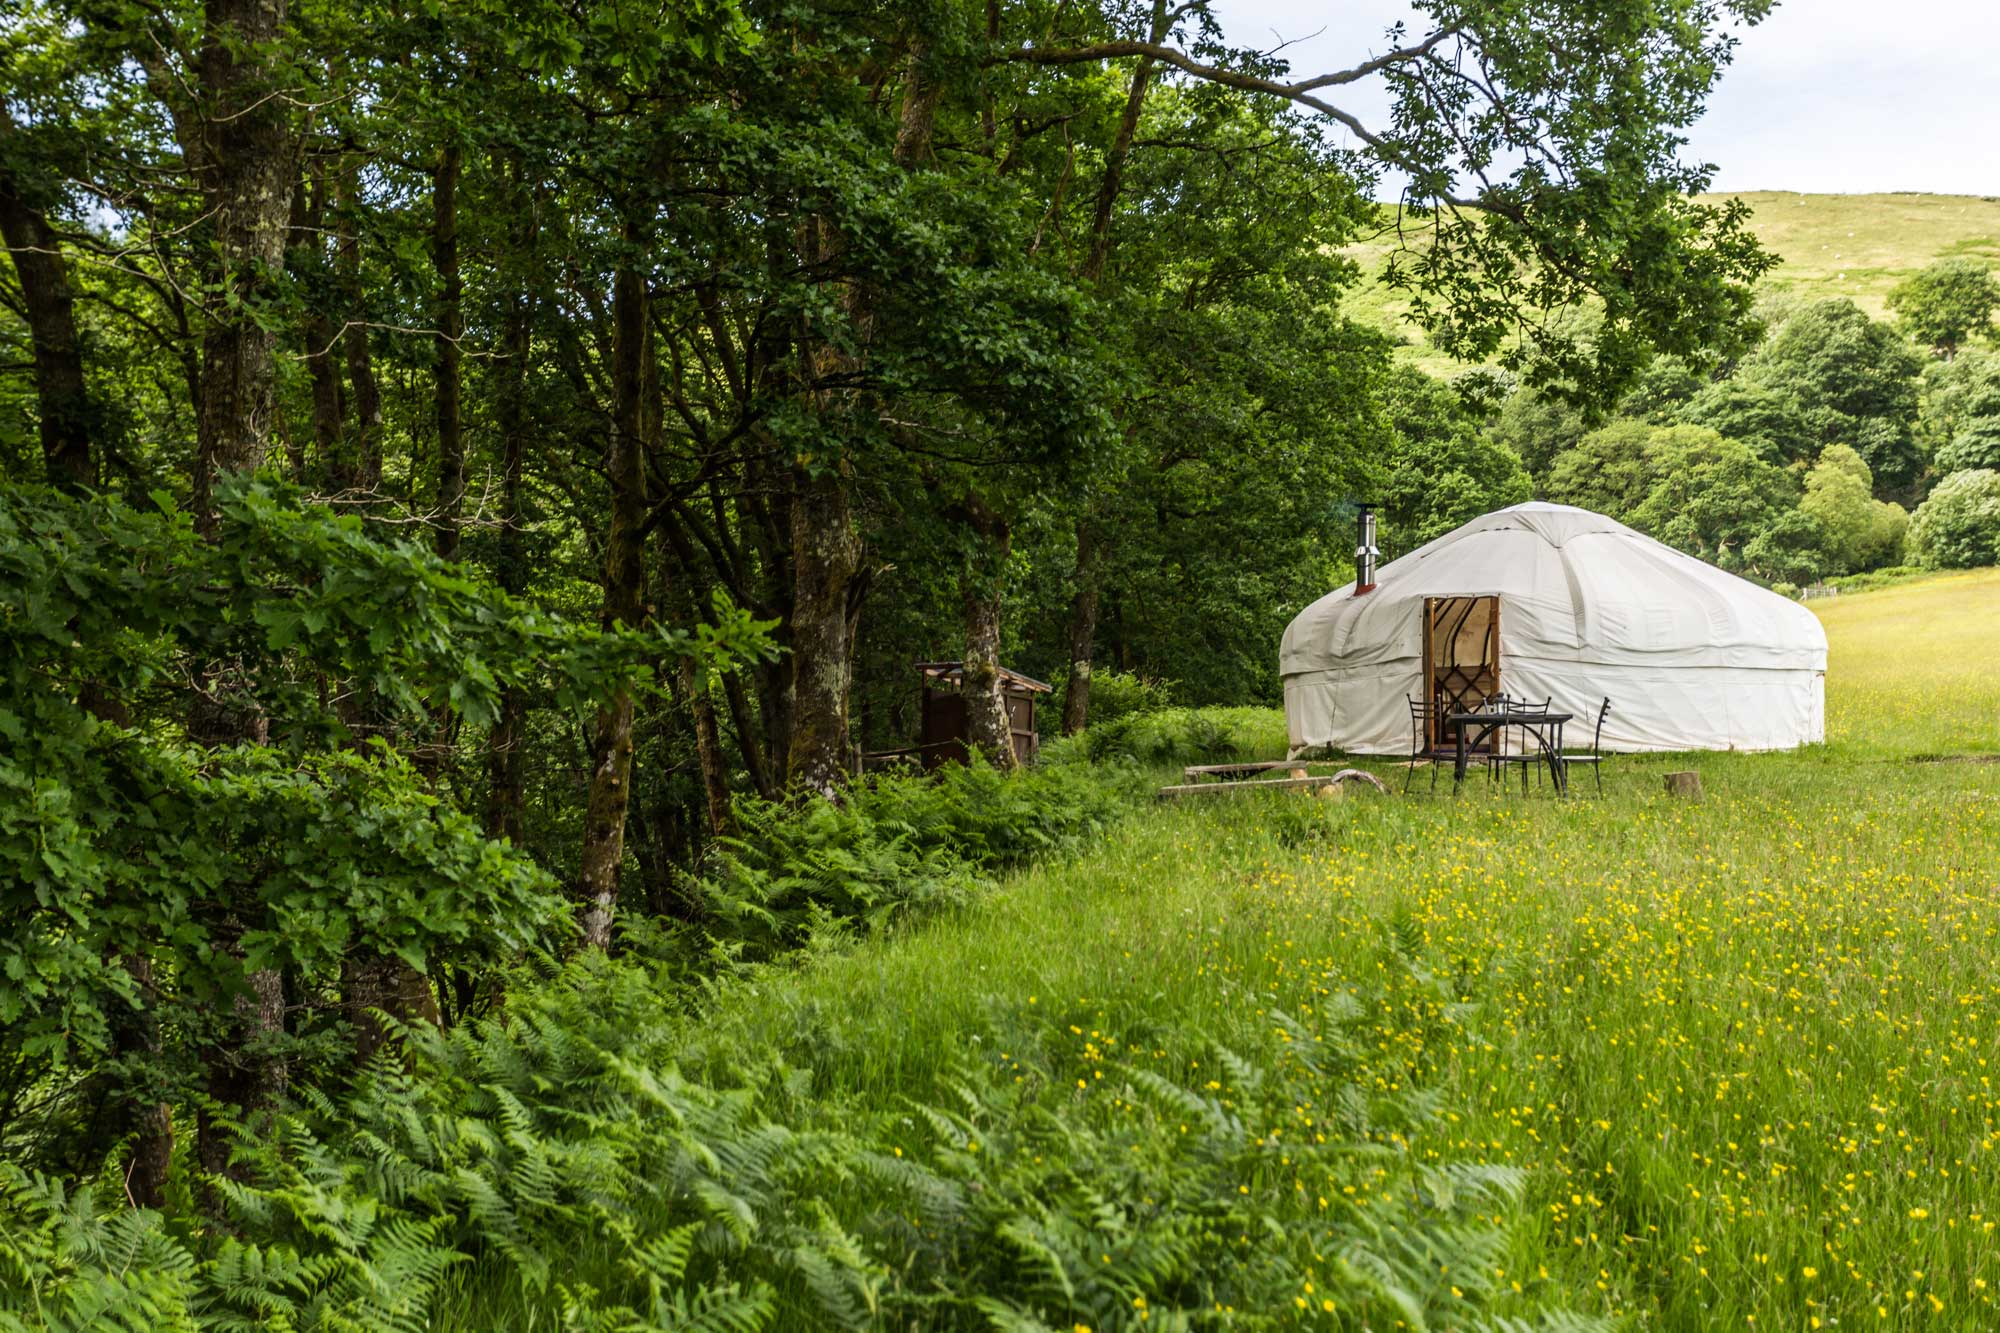 Yurt holidays in beautiful wildflower meadows